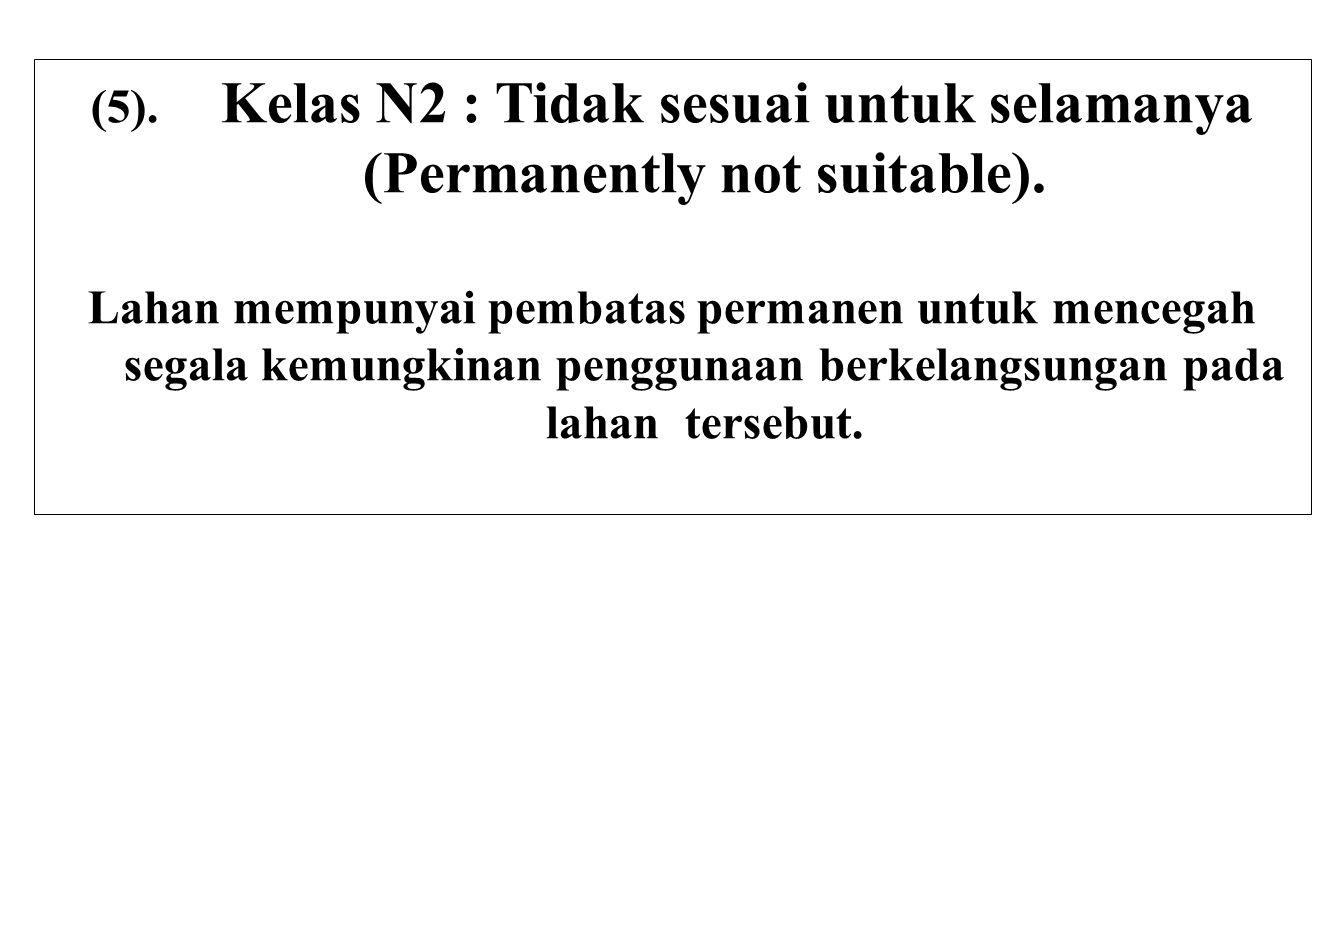 (5). Kelas N2 : Tidak sesuai untuk selamanya (Permanently not suitable). Lahan mempunyai pembatas permanen untuk mencegah segala kemungkinan penggunaa